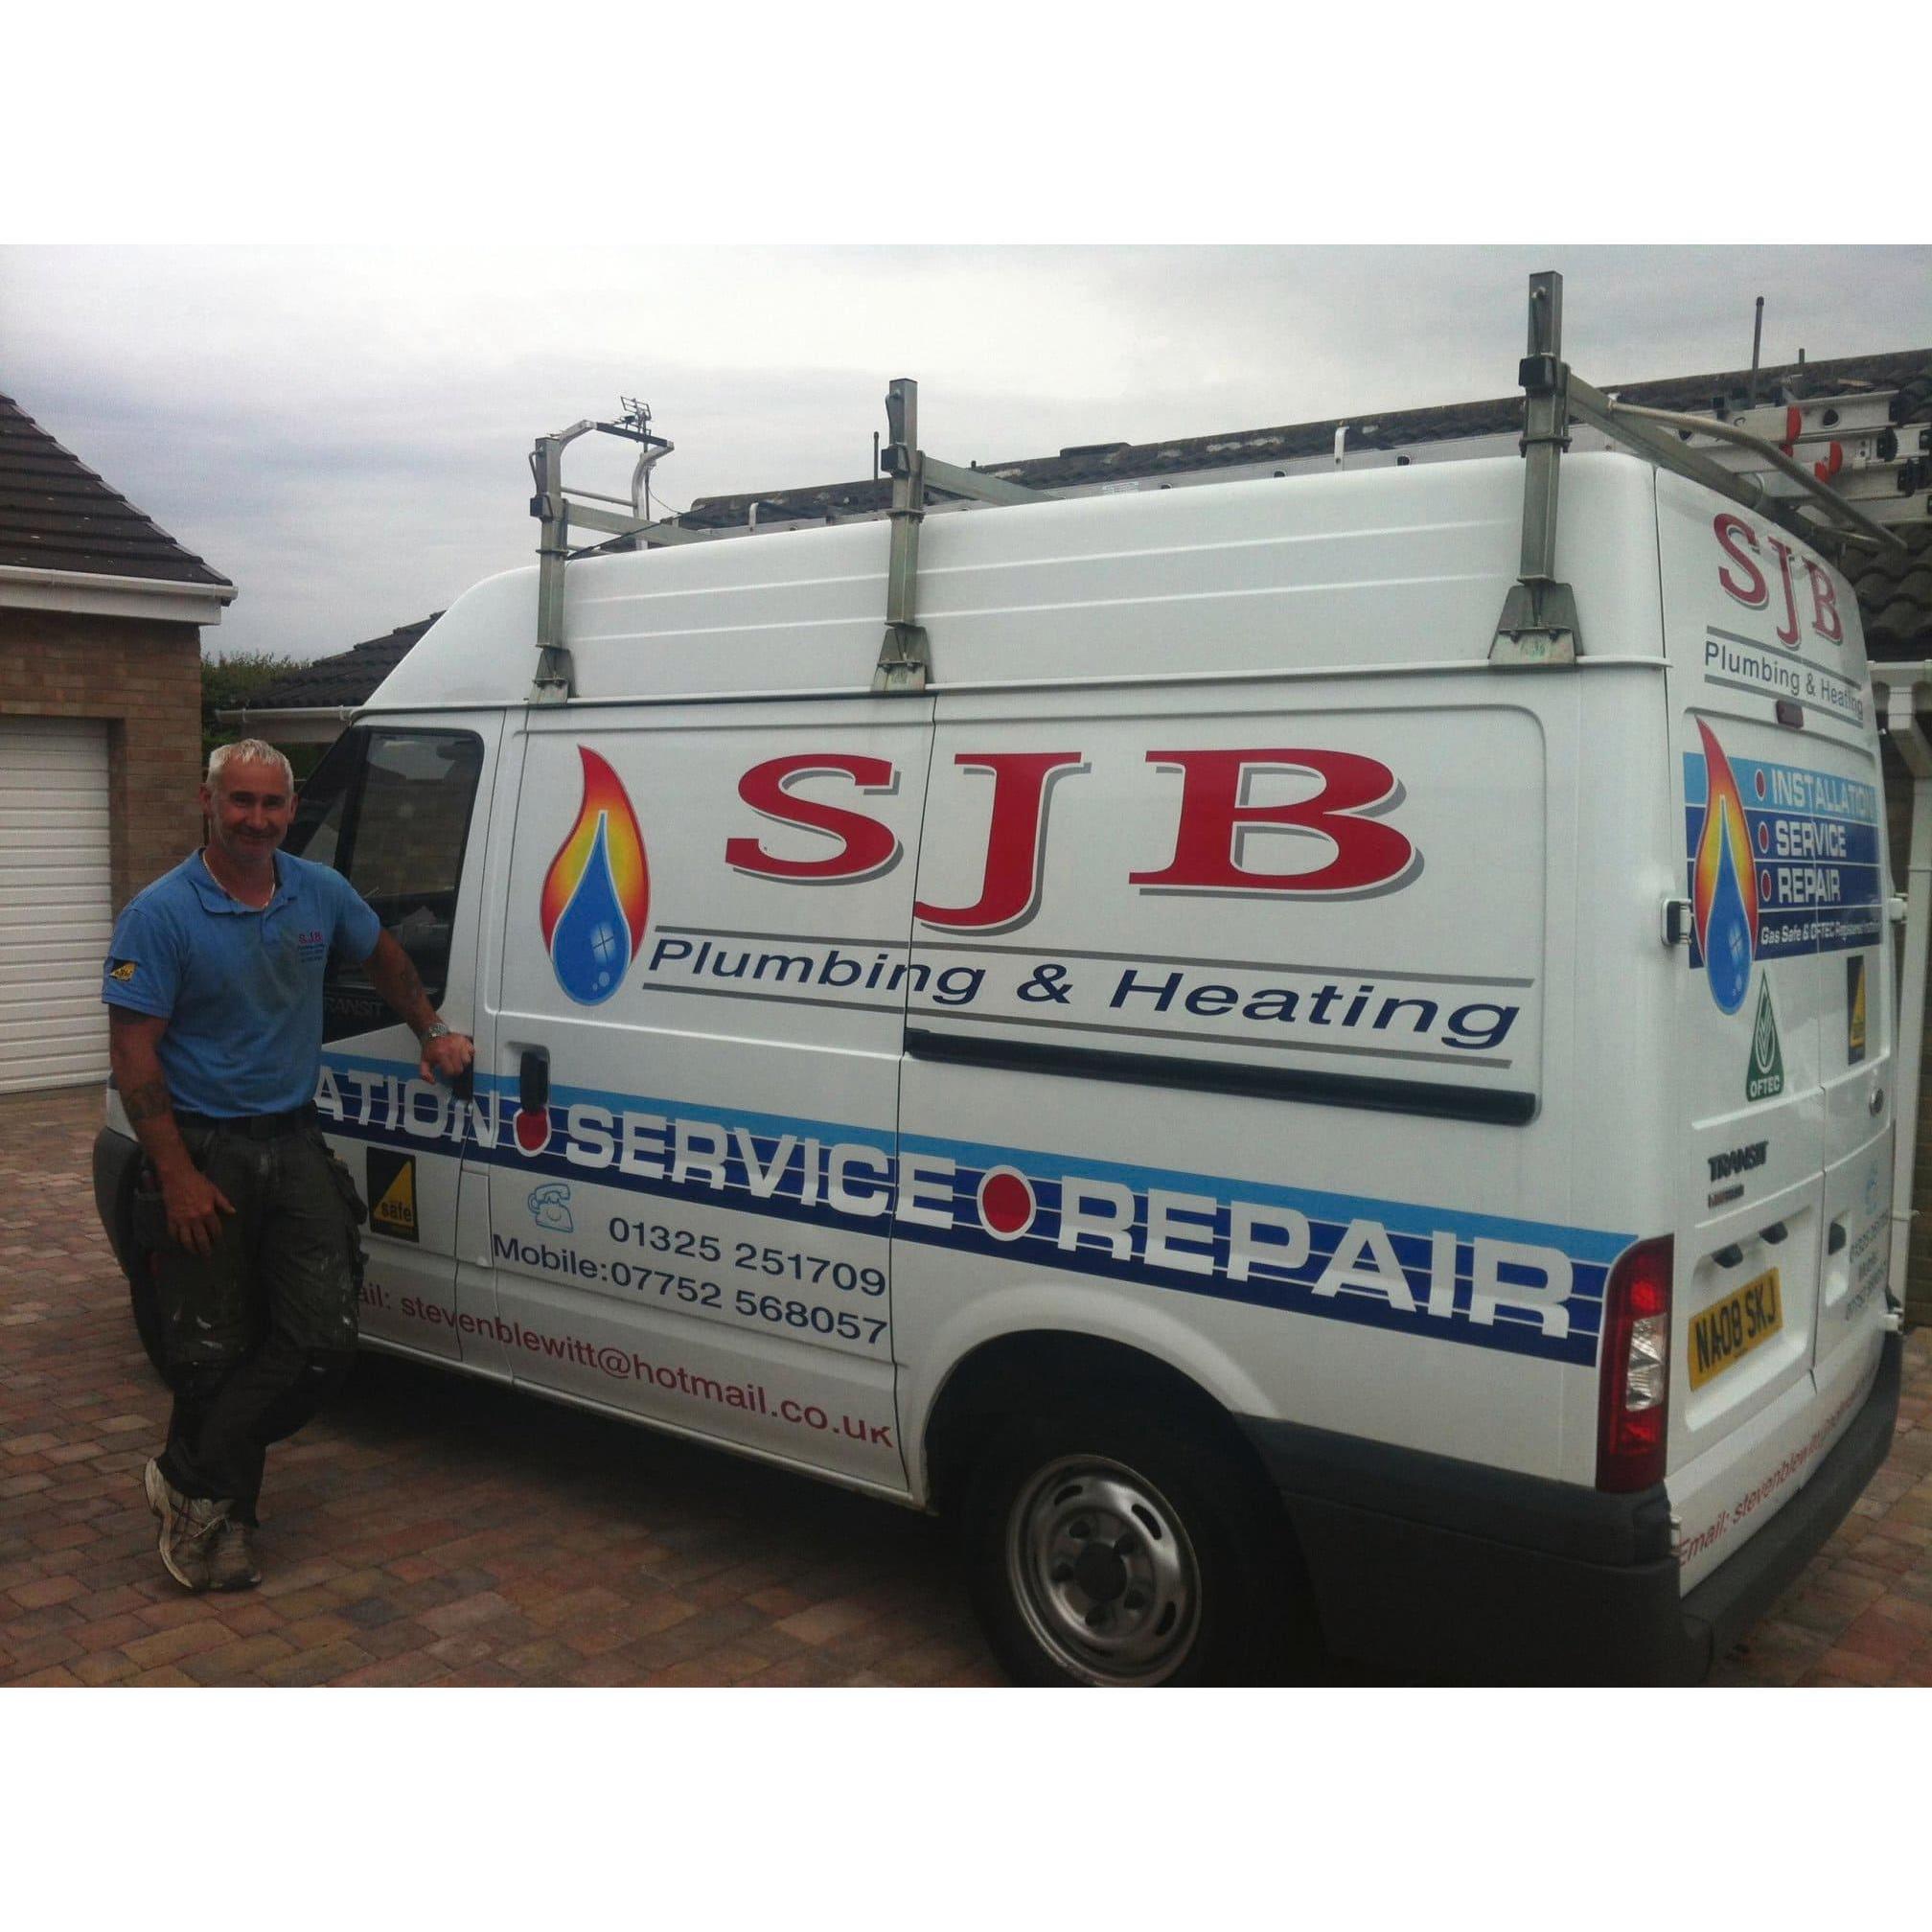 SJB Plumbing & Heating - Yarm, North Yorkshire  - 07752 568057 | ShowMeLocal.com